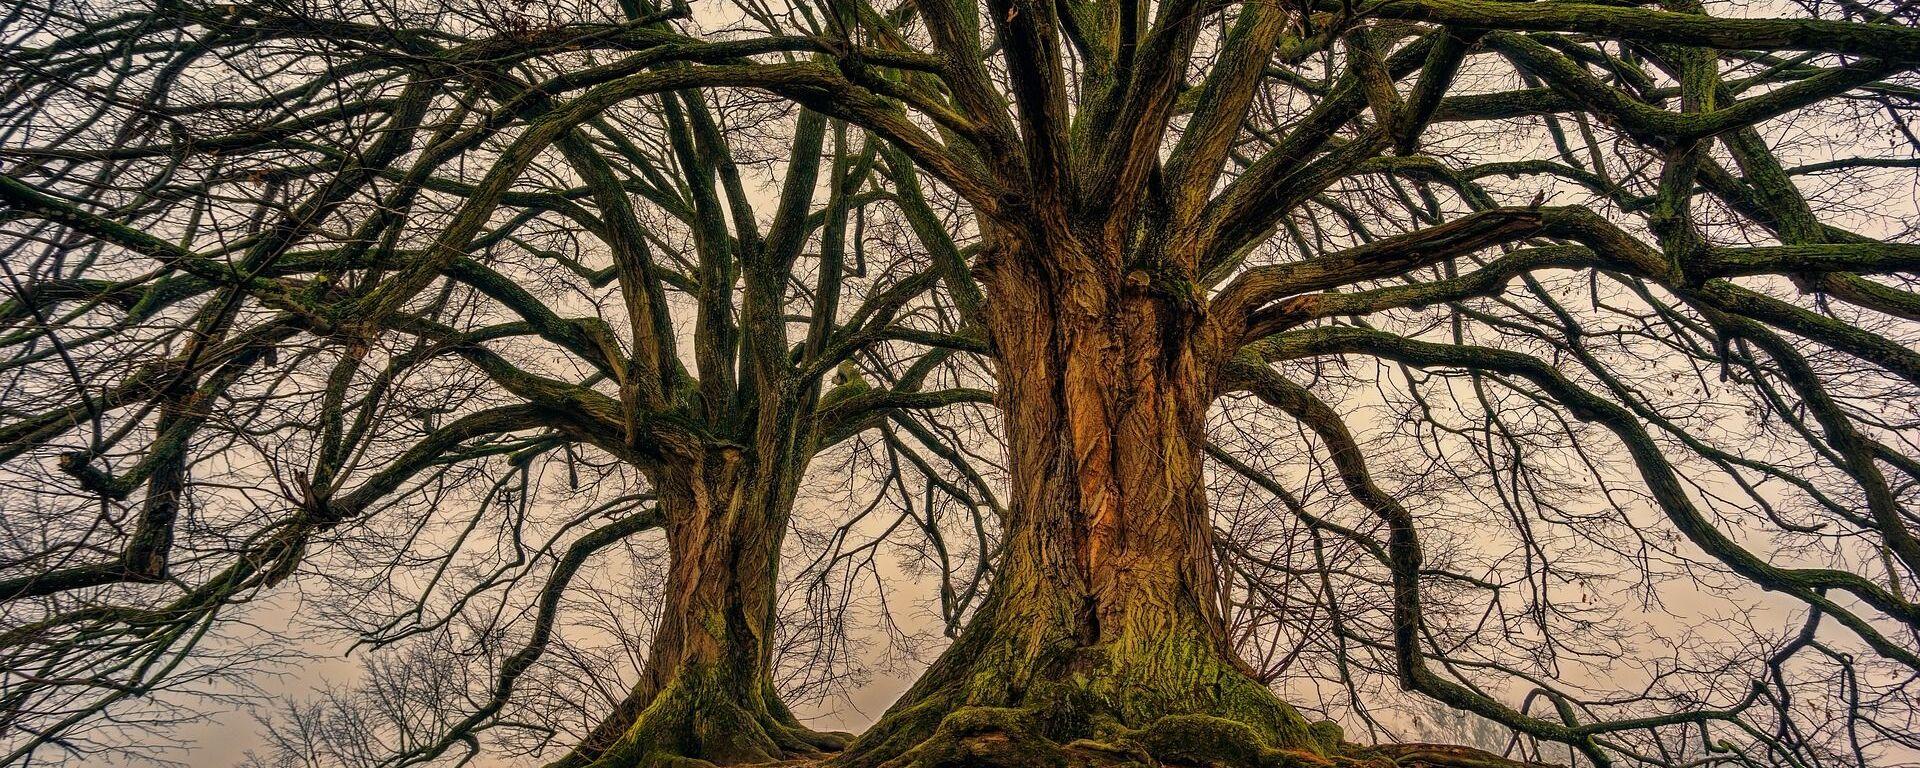 Árboles, árbol (imagen referencial) - Sputnik Mundo, 1920, 26.07.2021